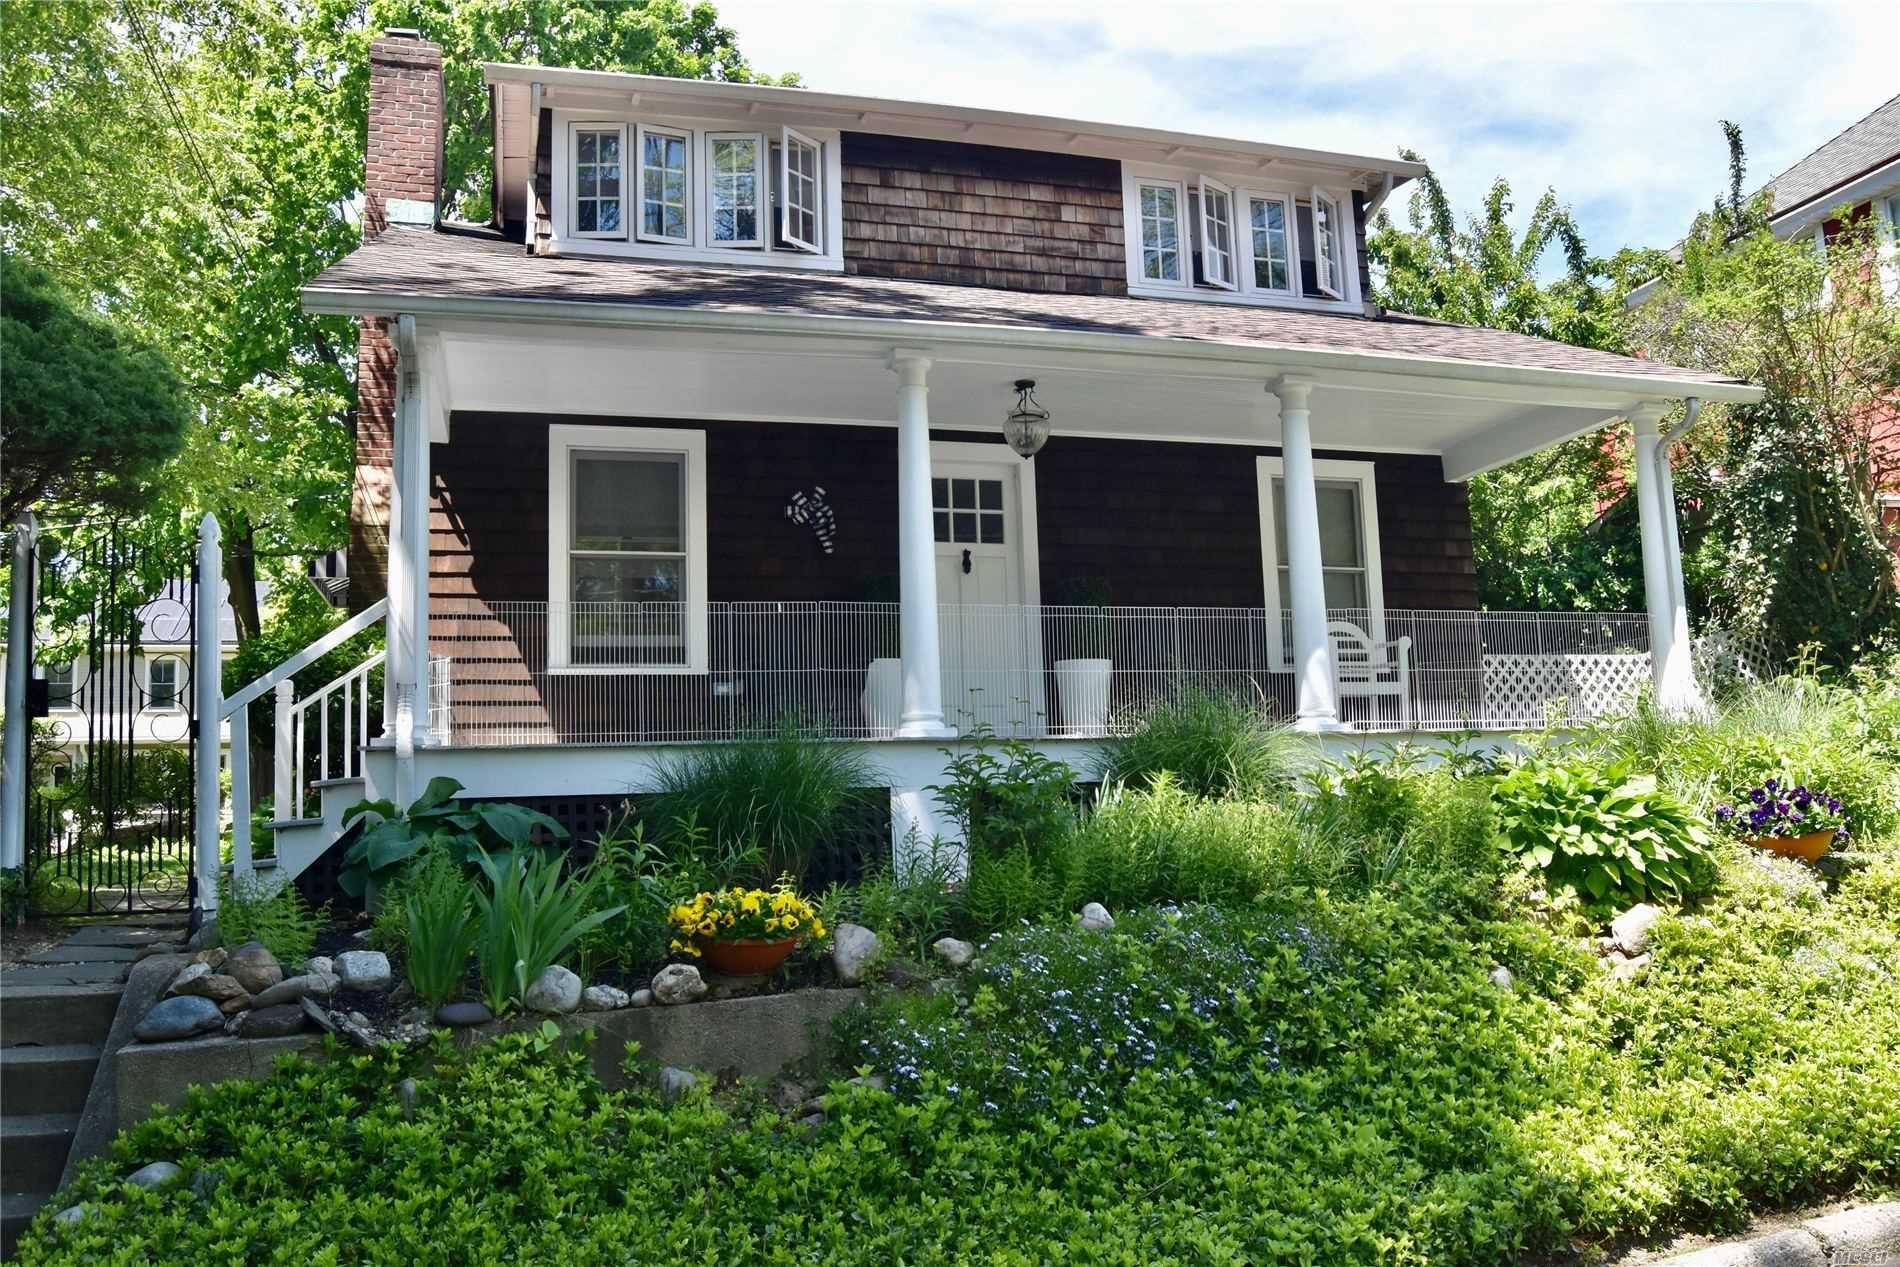 212 Littleworth Lane, Sea Cliff, NY 11579 - MLS#: 3200601